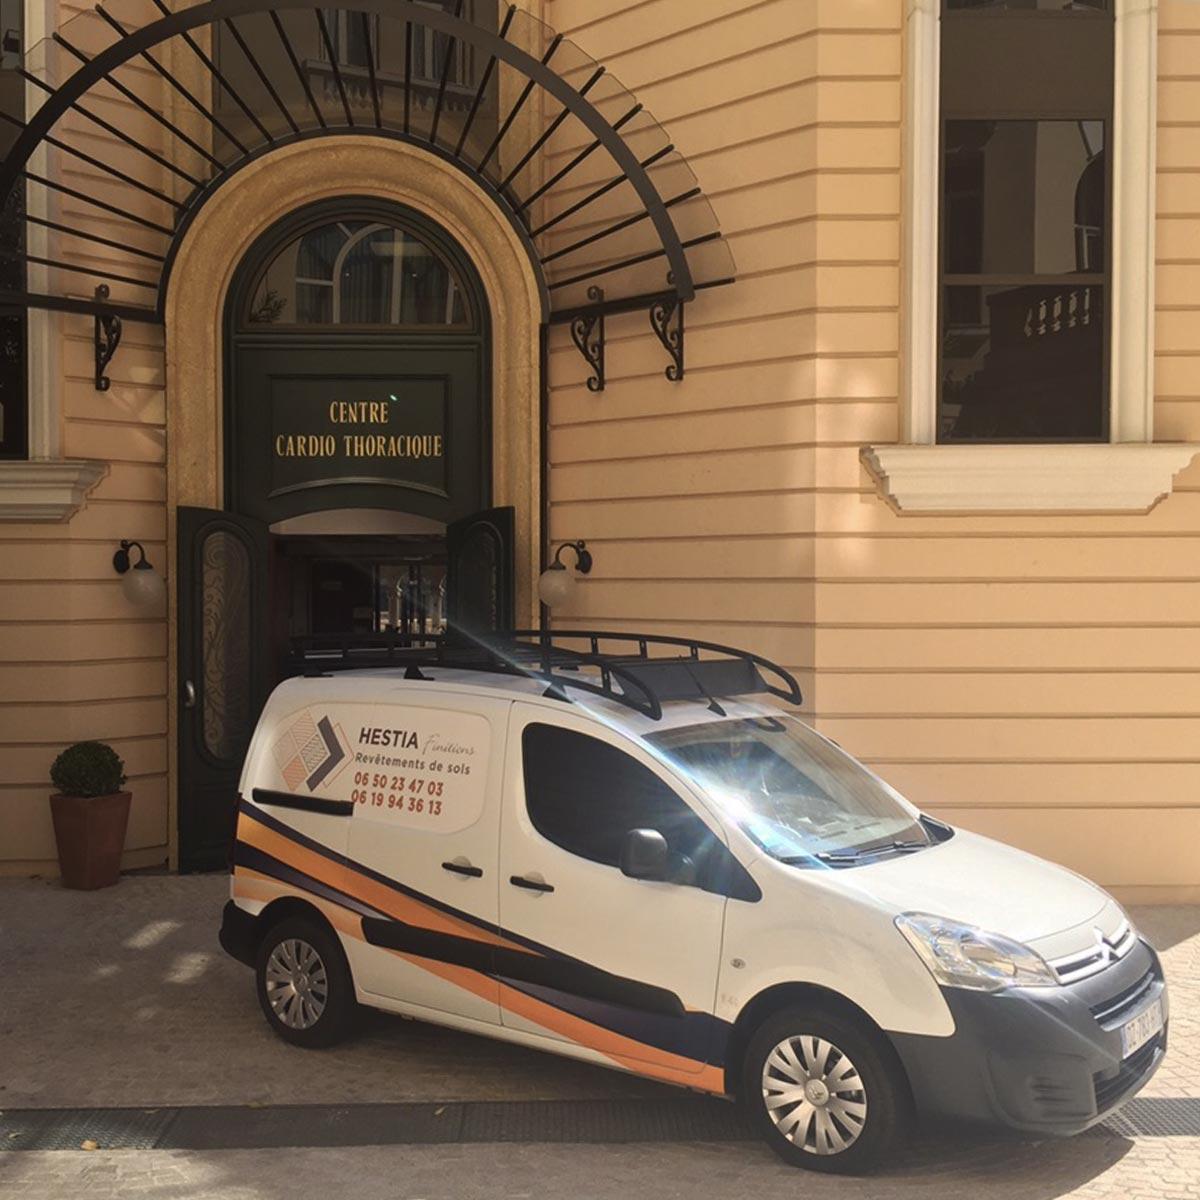 Hestia Finitions en intervention au centre cardio thoracique de Monaco